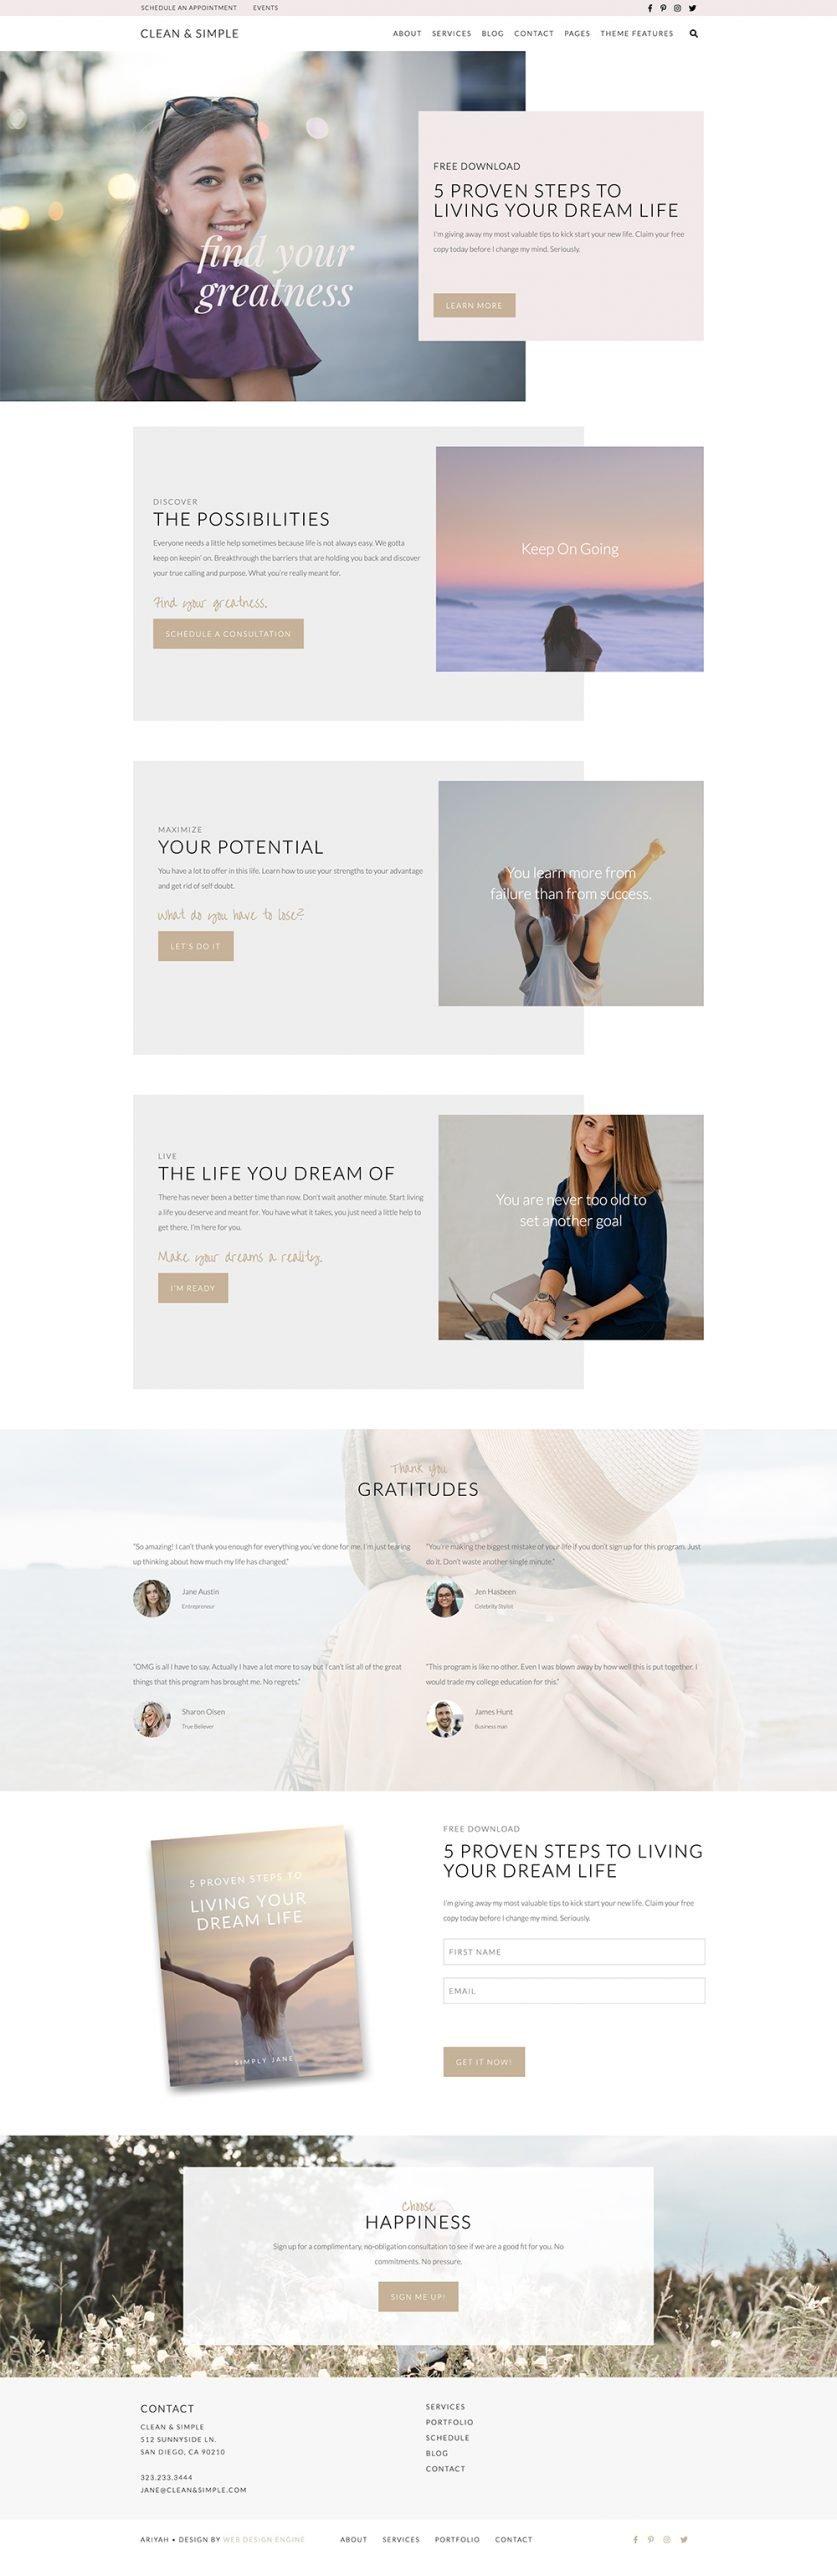 Clean & Simple Theme